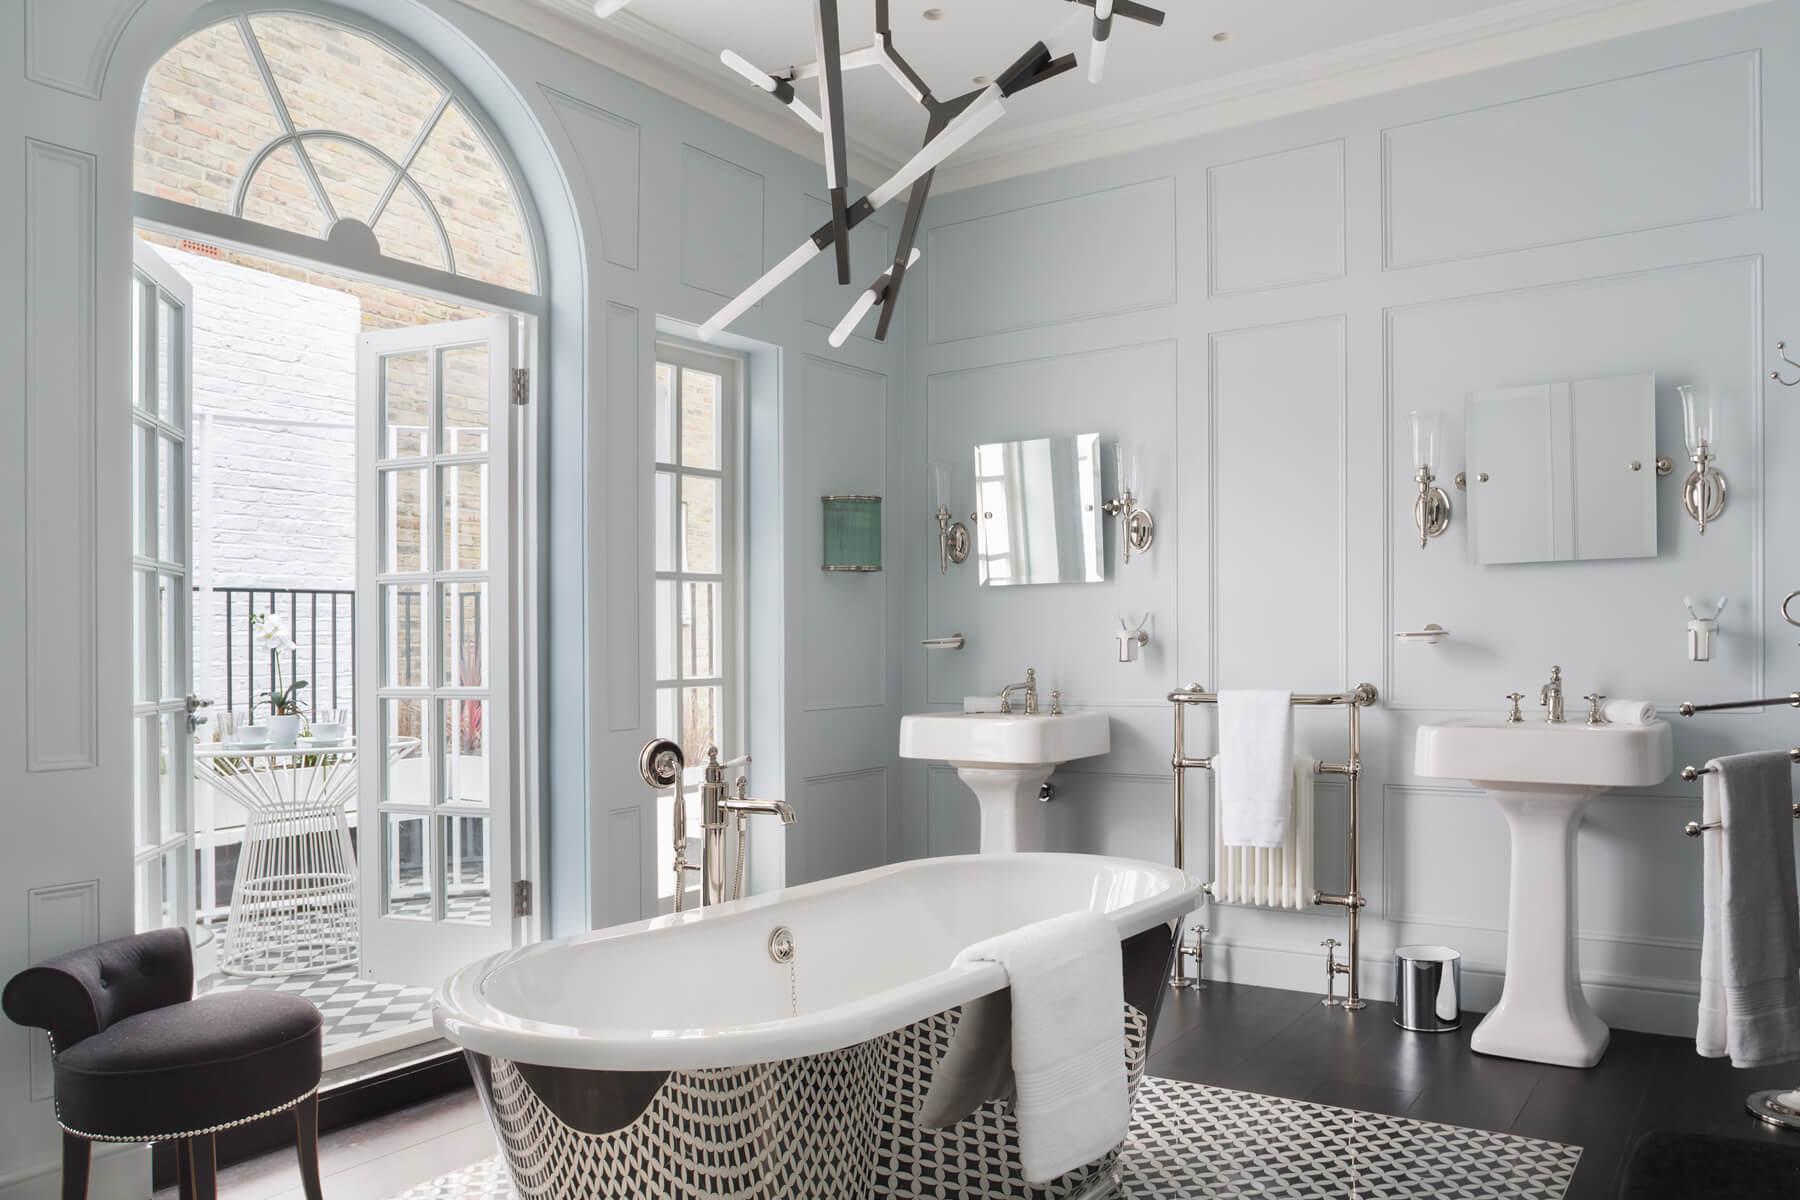 Trafalgar heated towel rail Victorian Bathrooms